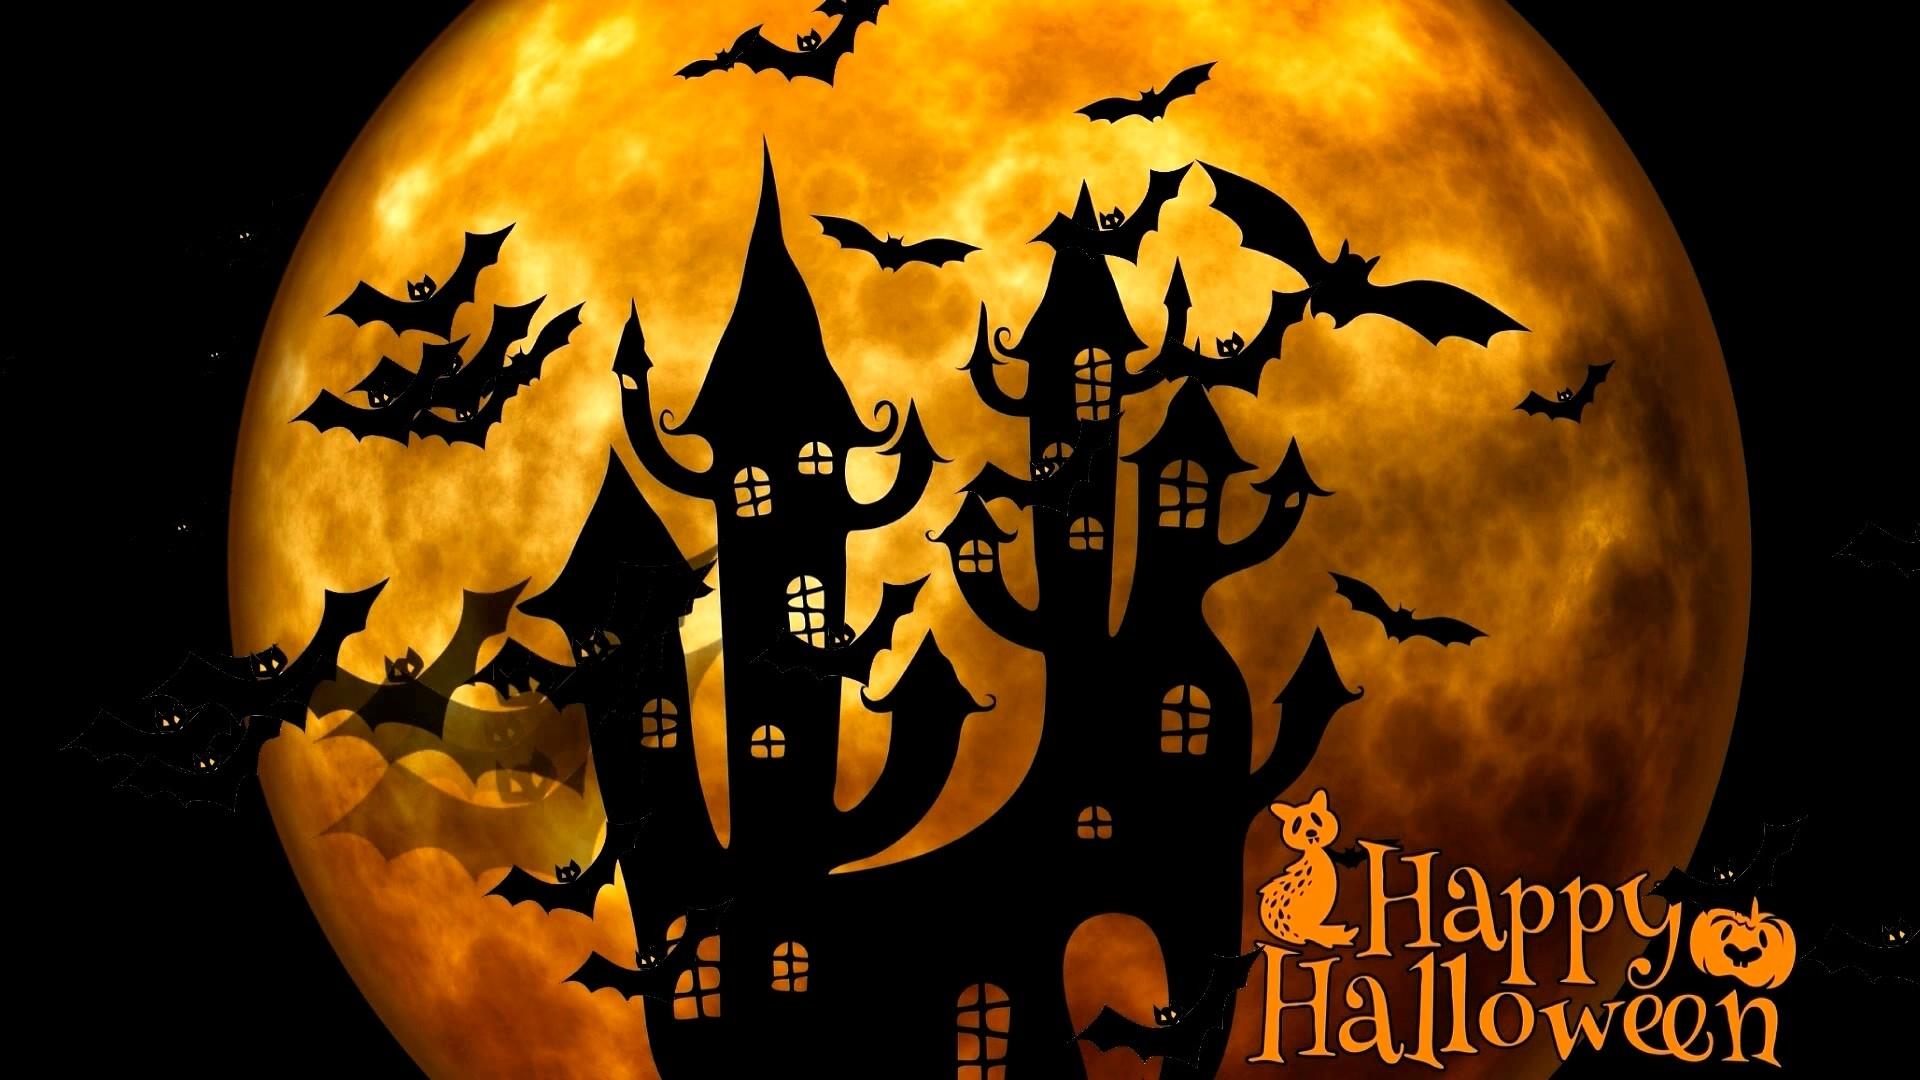 Halloween Greeting Card Wallpaper theme